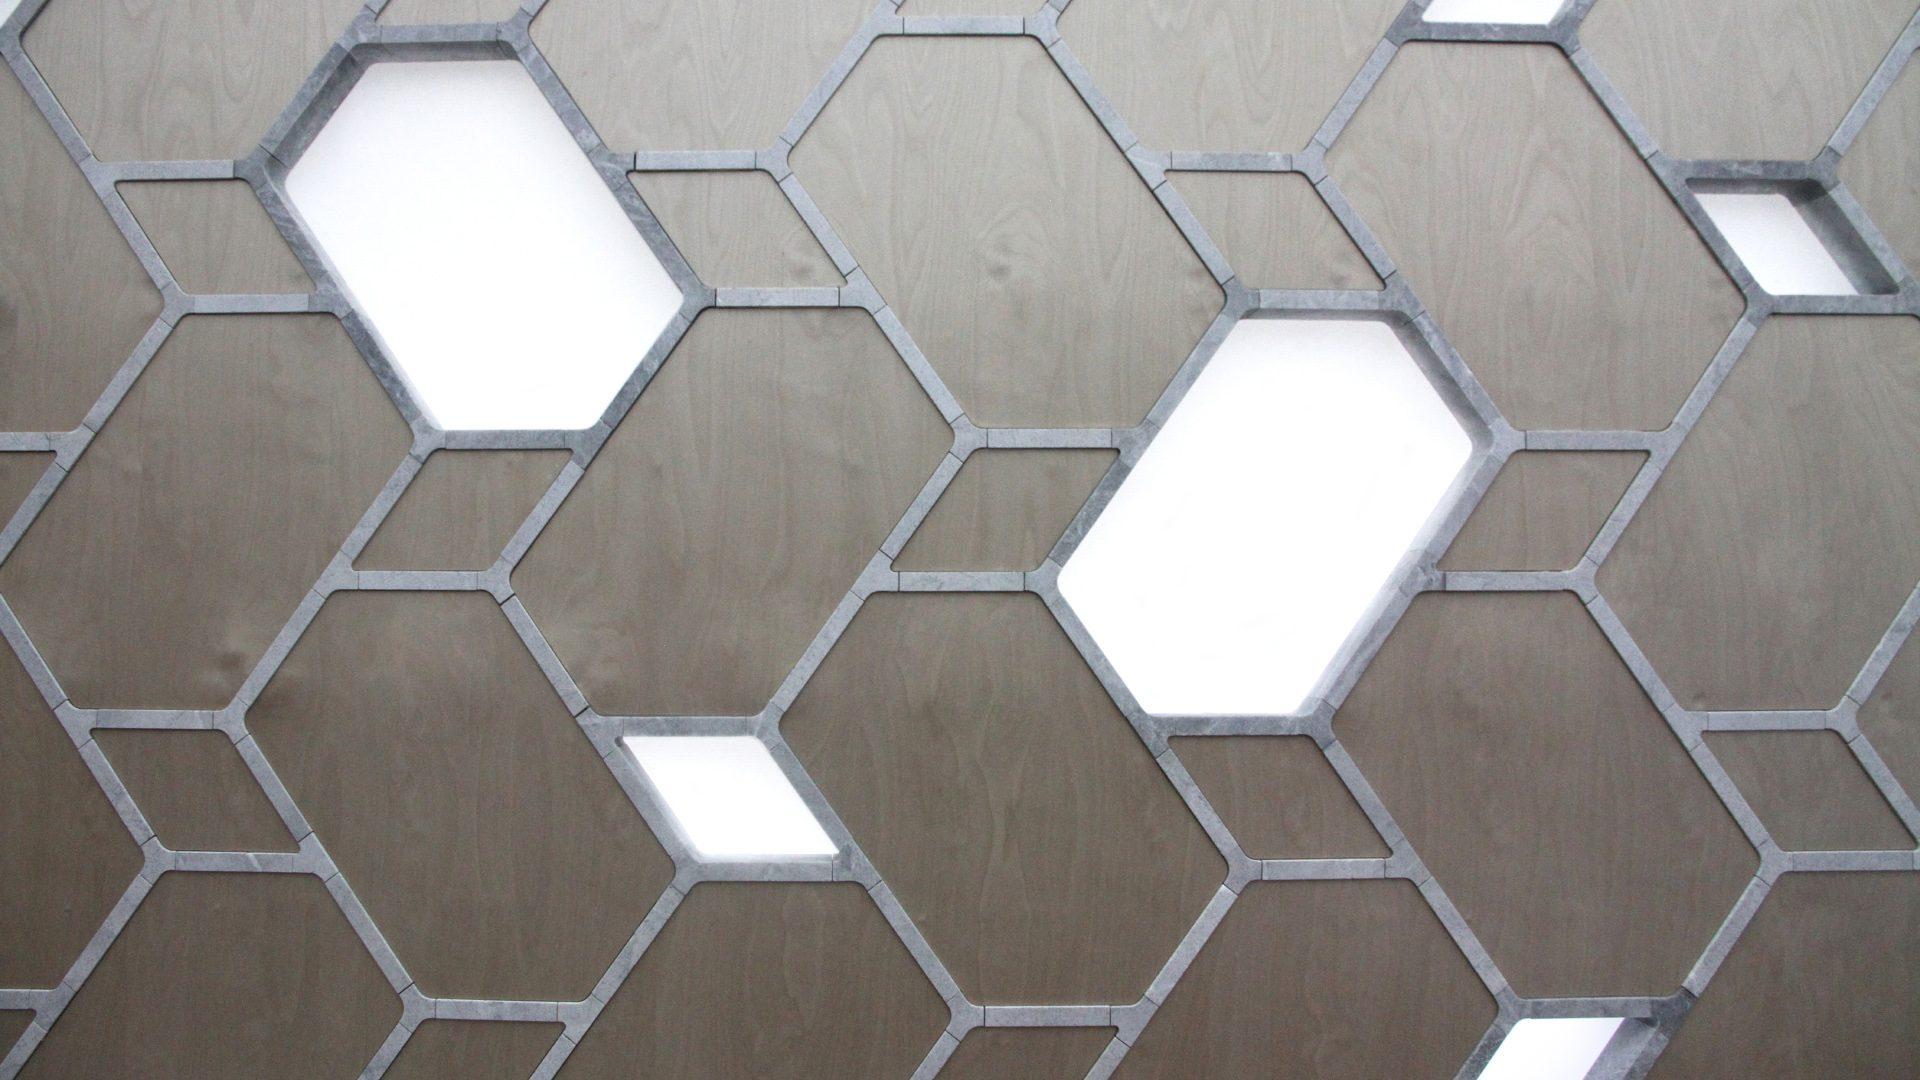 Heterotopia, AD interior 2013 - Credit : RF Studio